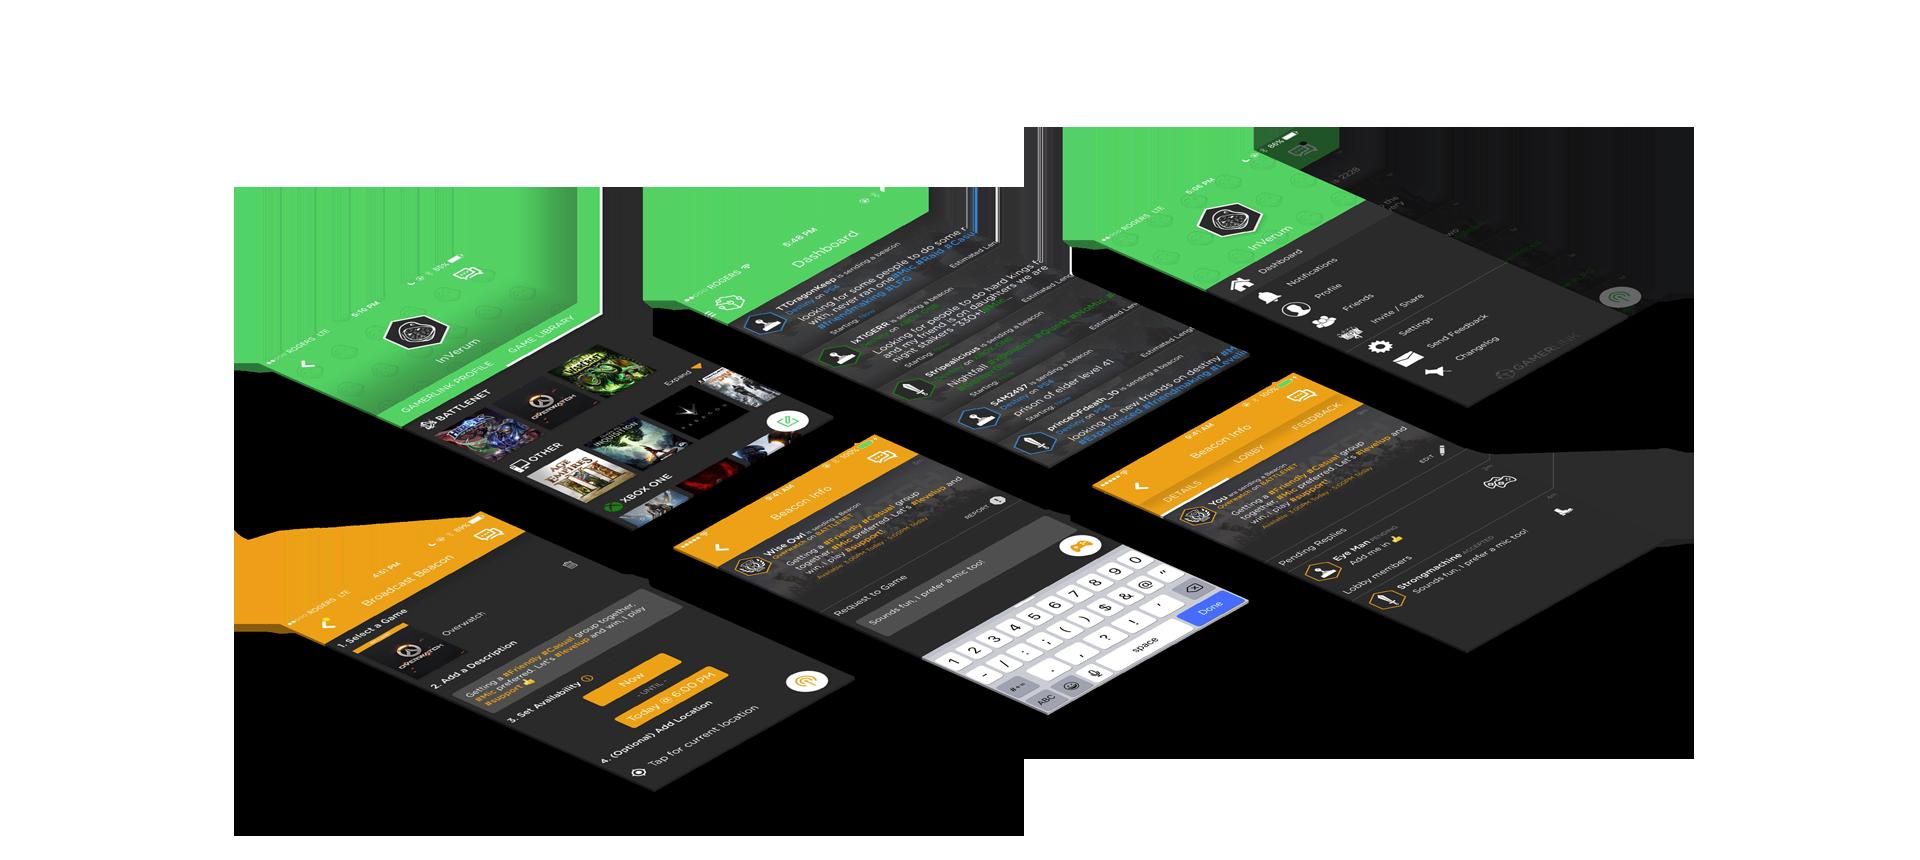 Download The Best Rocket League LFG App